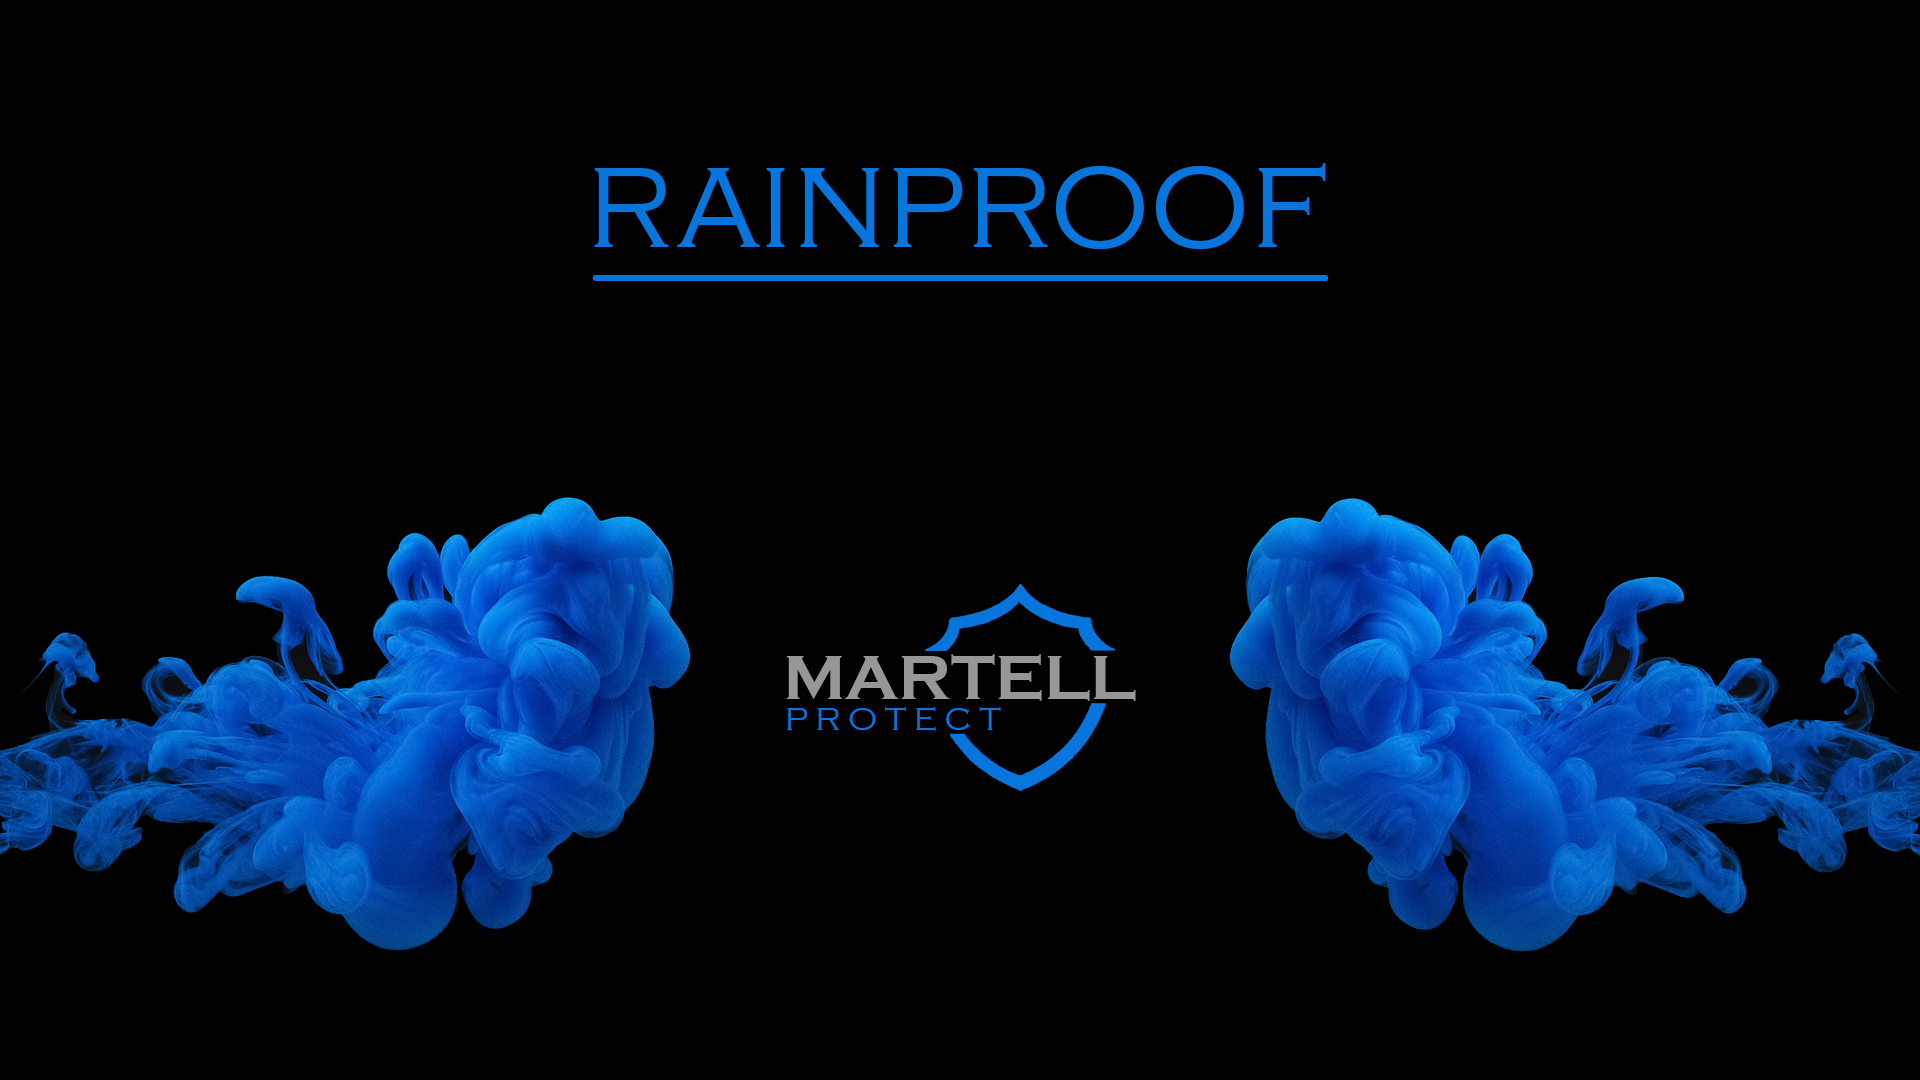 MARTELL PROTECT RAINPROOF – RUBANS ÉLASTIQUES AVEC FINITION HYDROFUGE